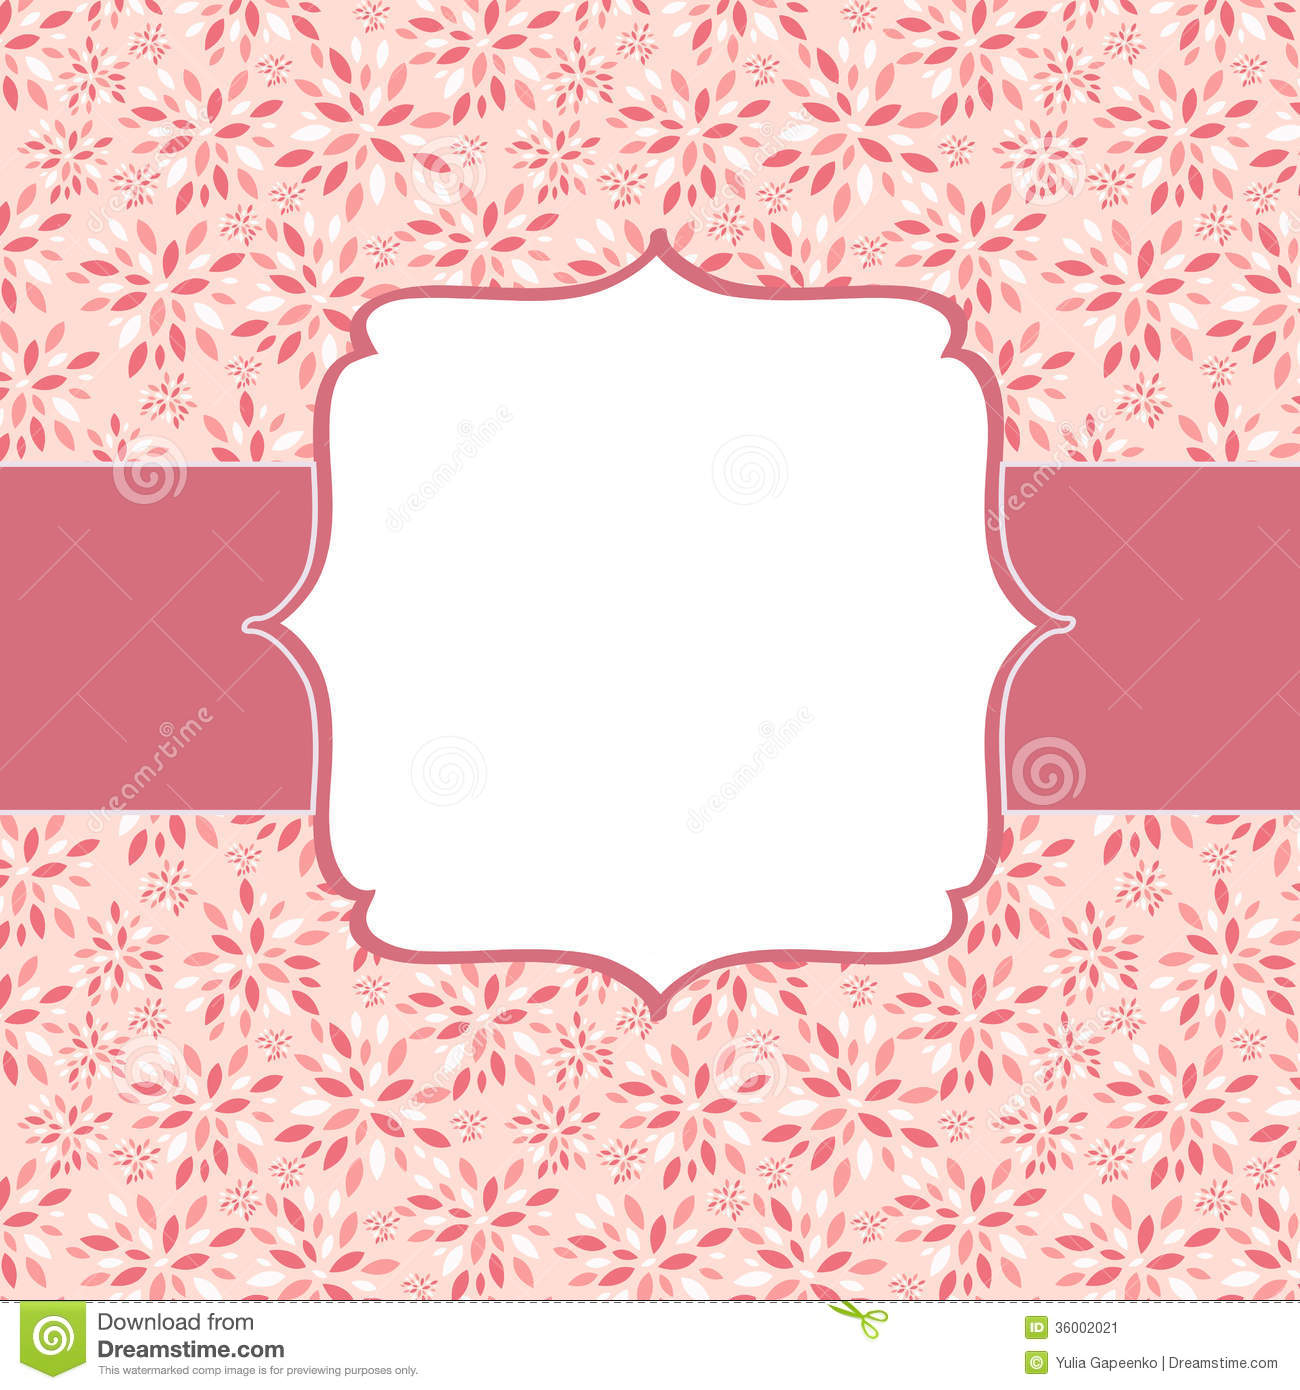 19 Vector Cute Frame Images - Cute Vector Frames, Cute Vector Frames ...